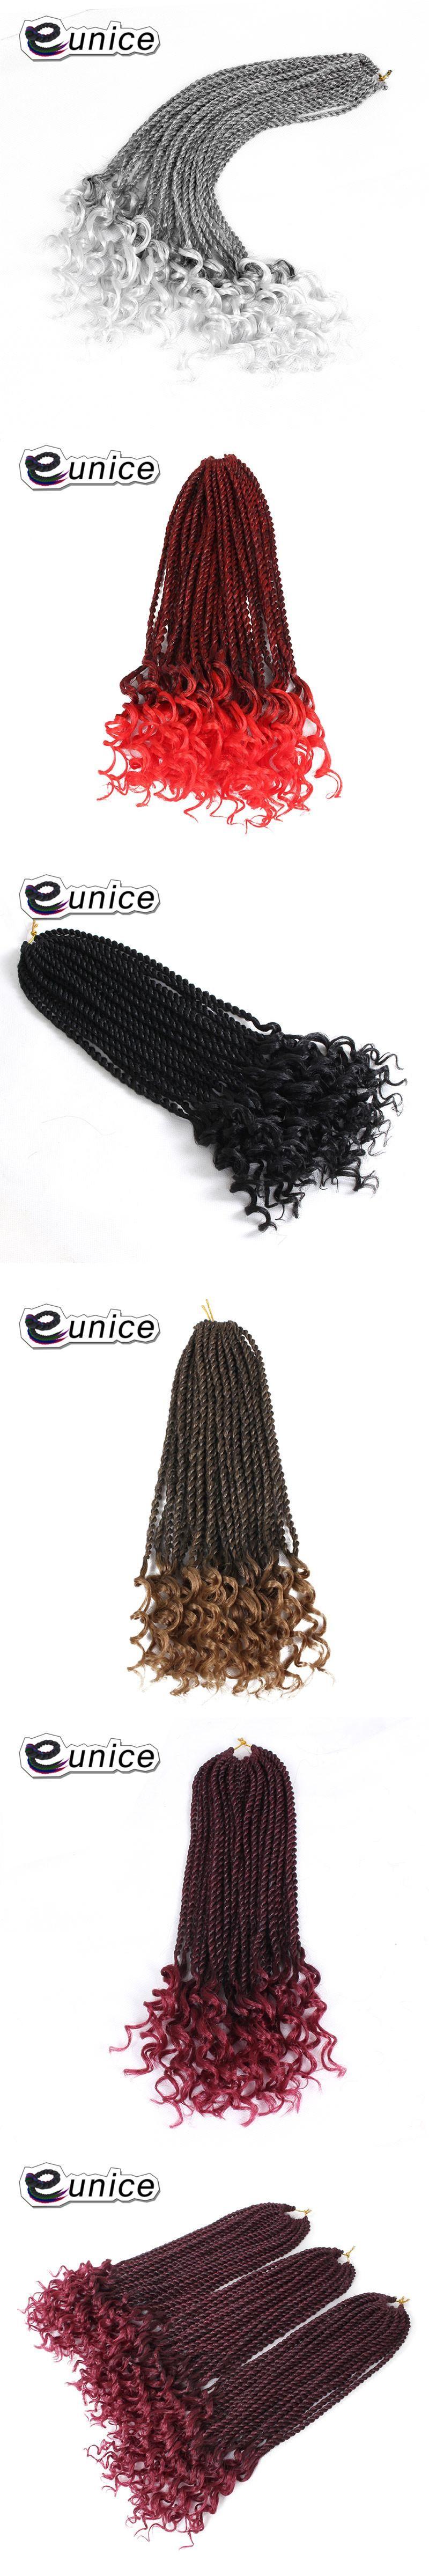 Eunice Hair Crochet Braids 16inch Synthetic Braiding Pre Curled